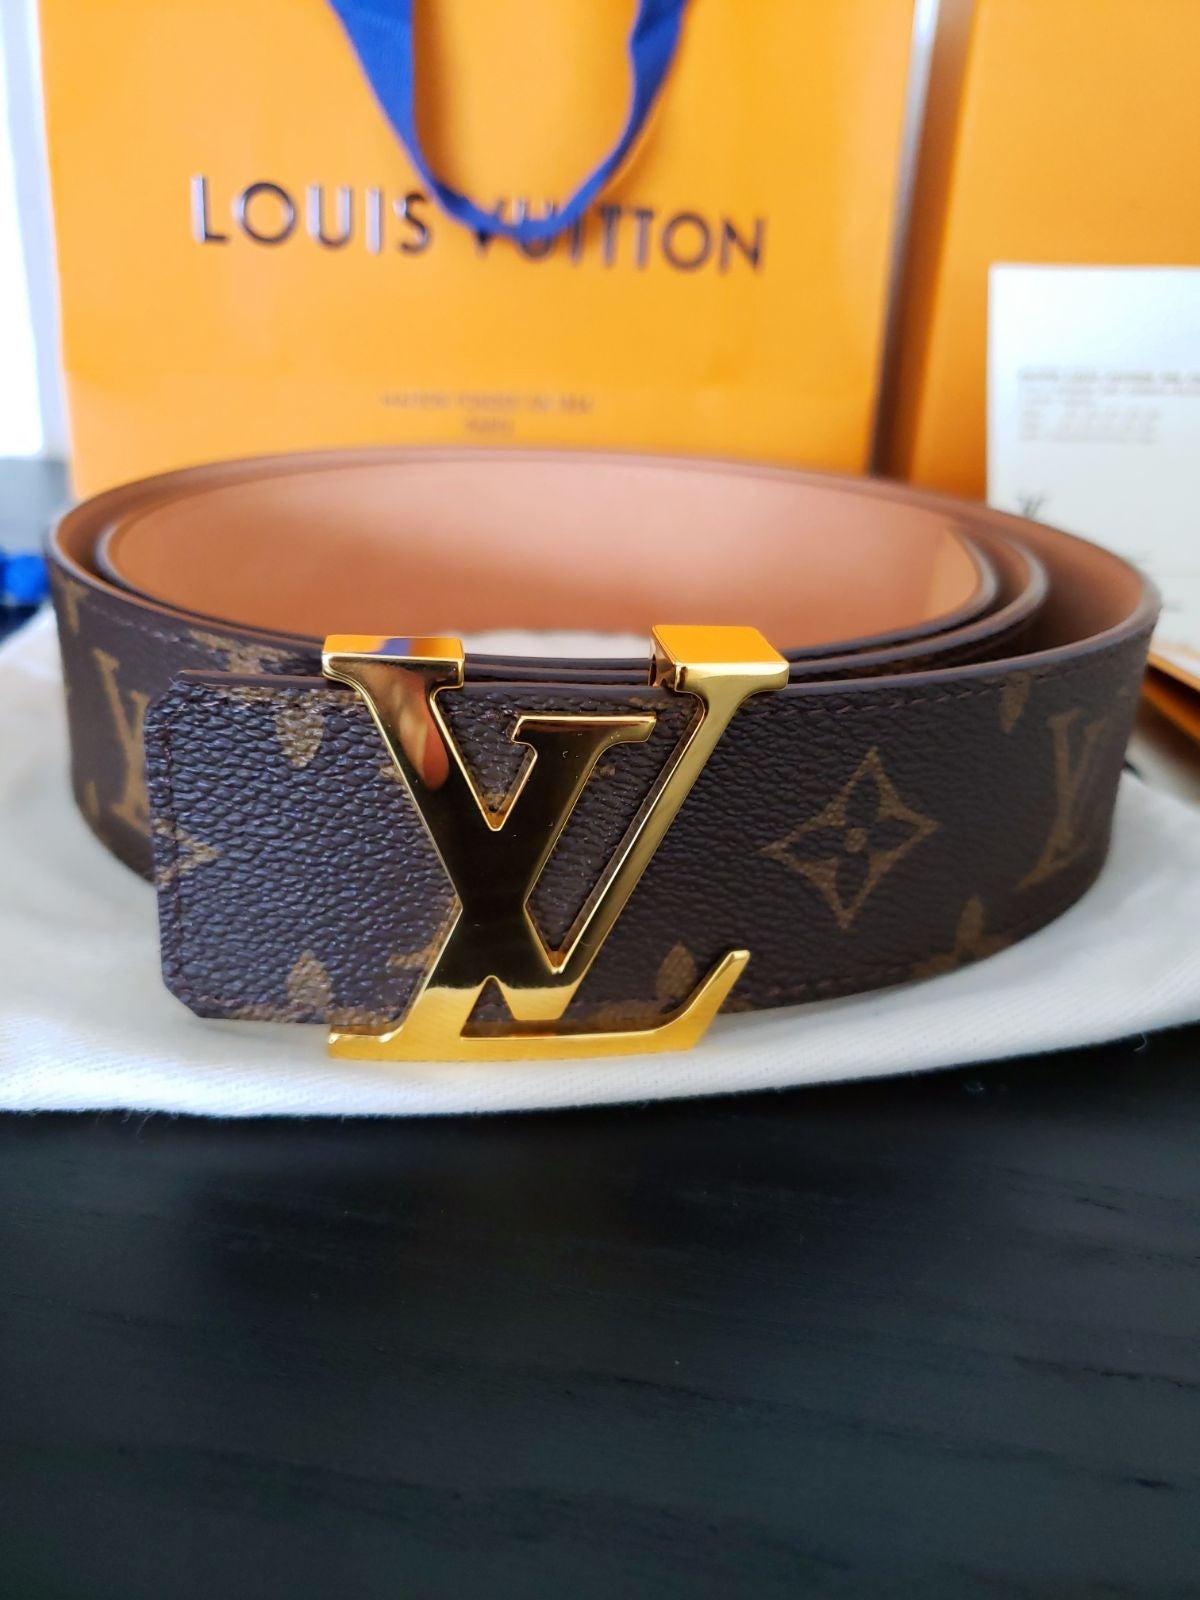 Louis Vuitton Monogram Belt 110cm